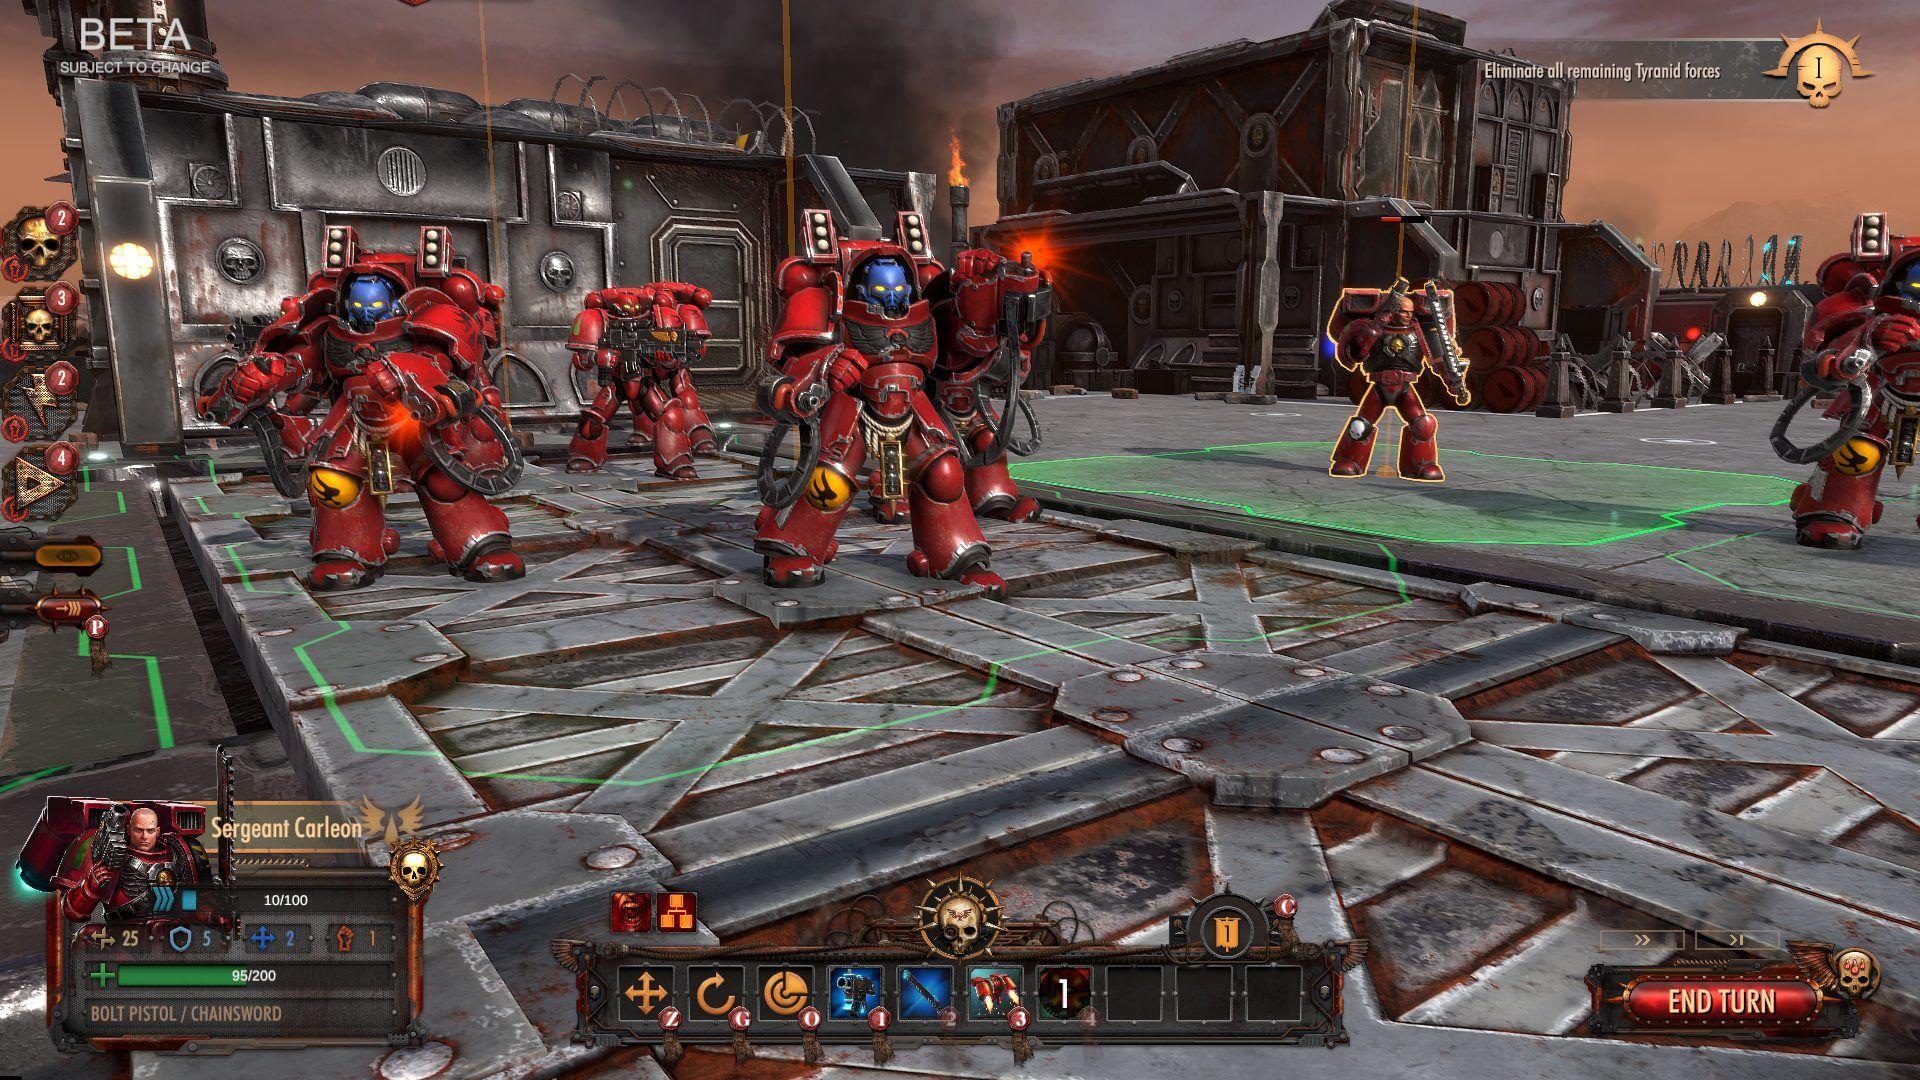 گیم پلی بازی Warhammer 40000